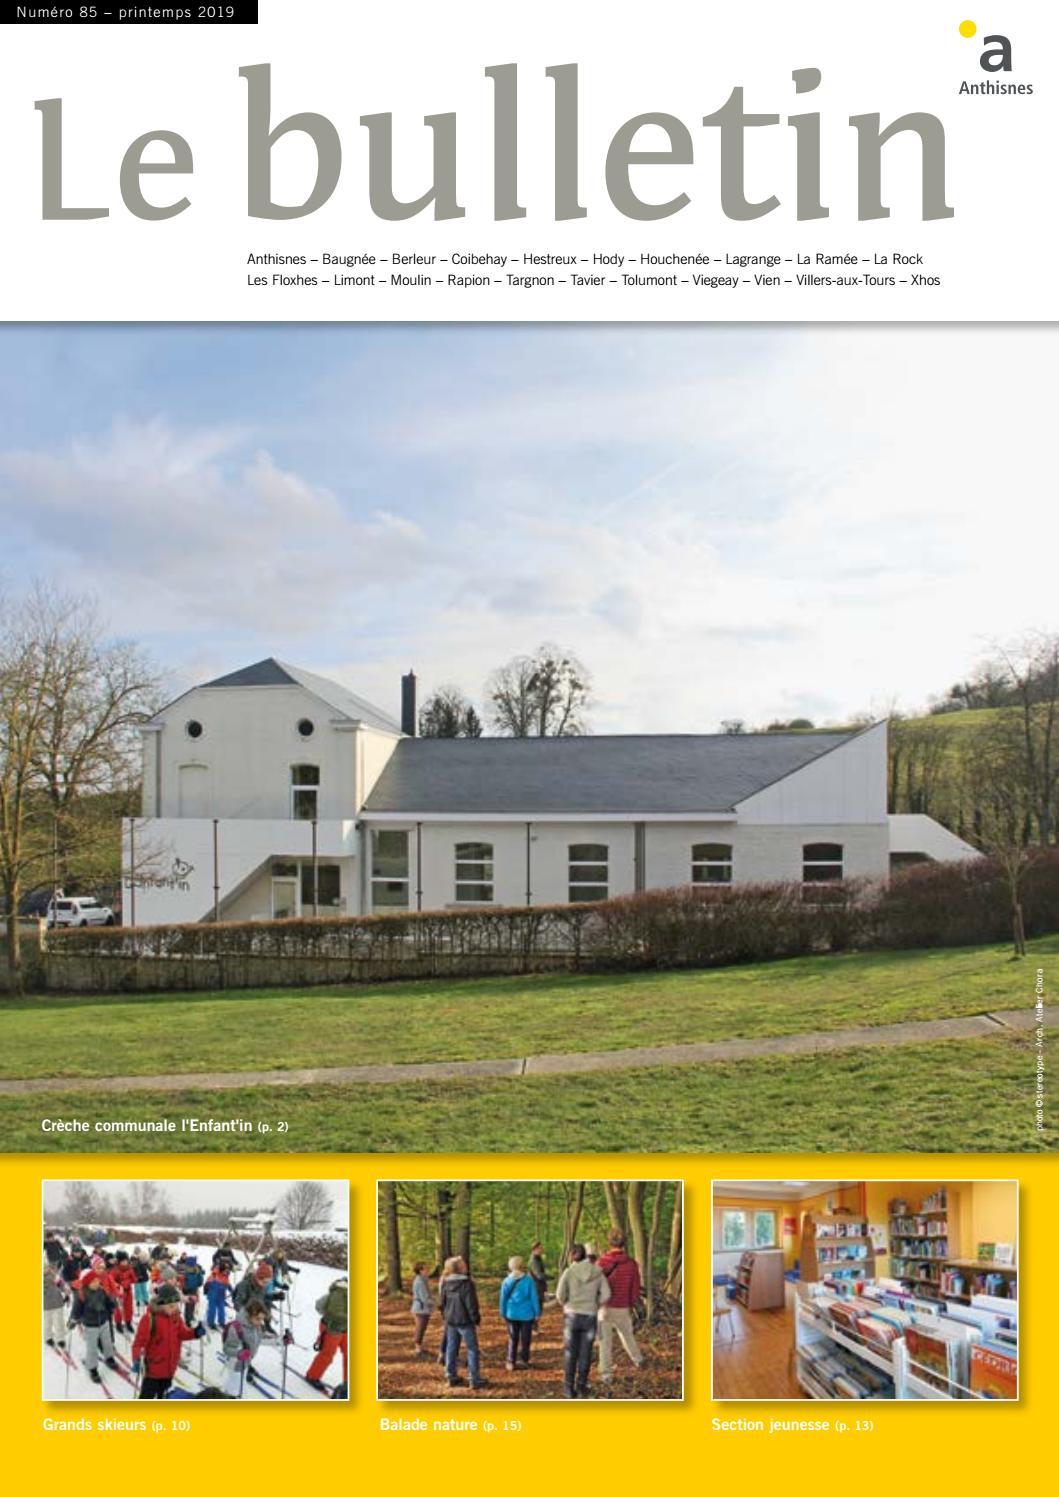 Verre Clair Saint Maximin le bulletin n°85 - printemps 2019commune d'anthisnes - issuu